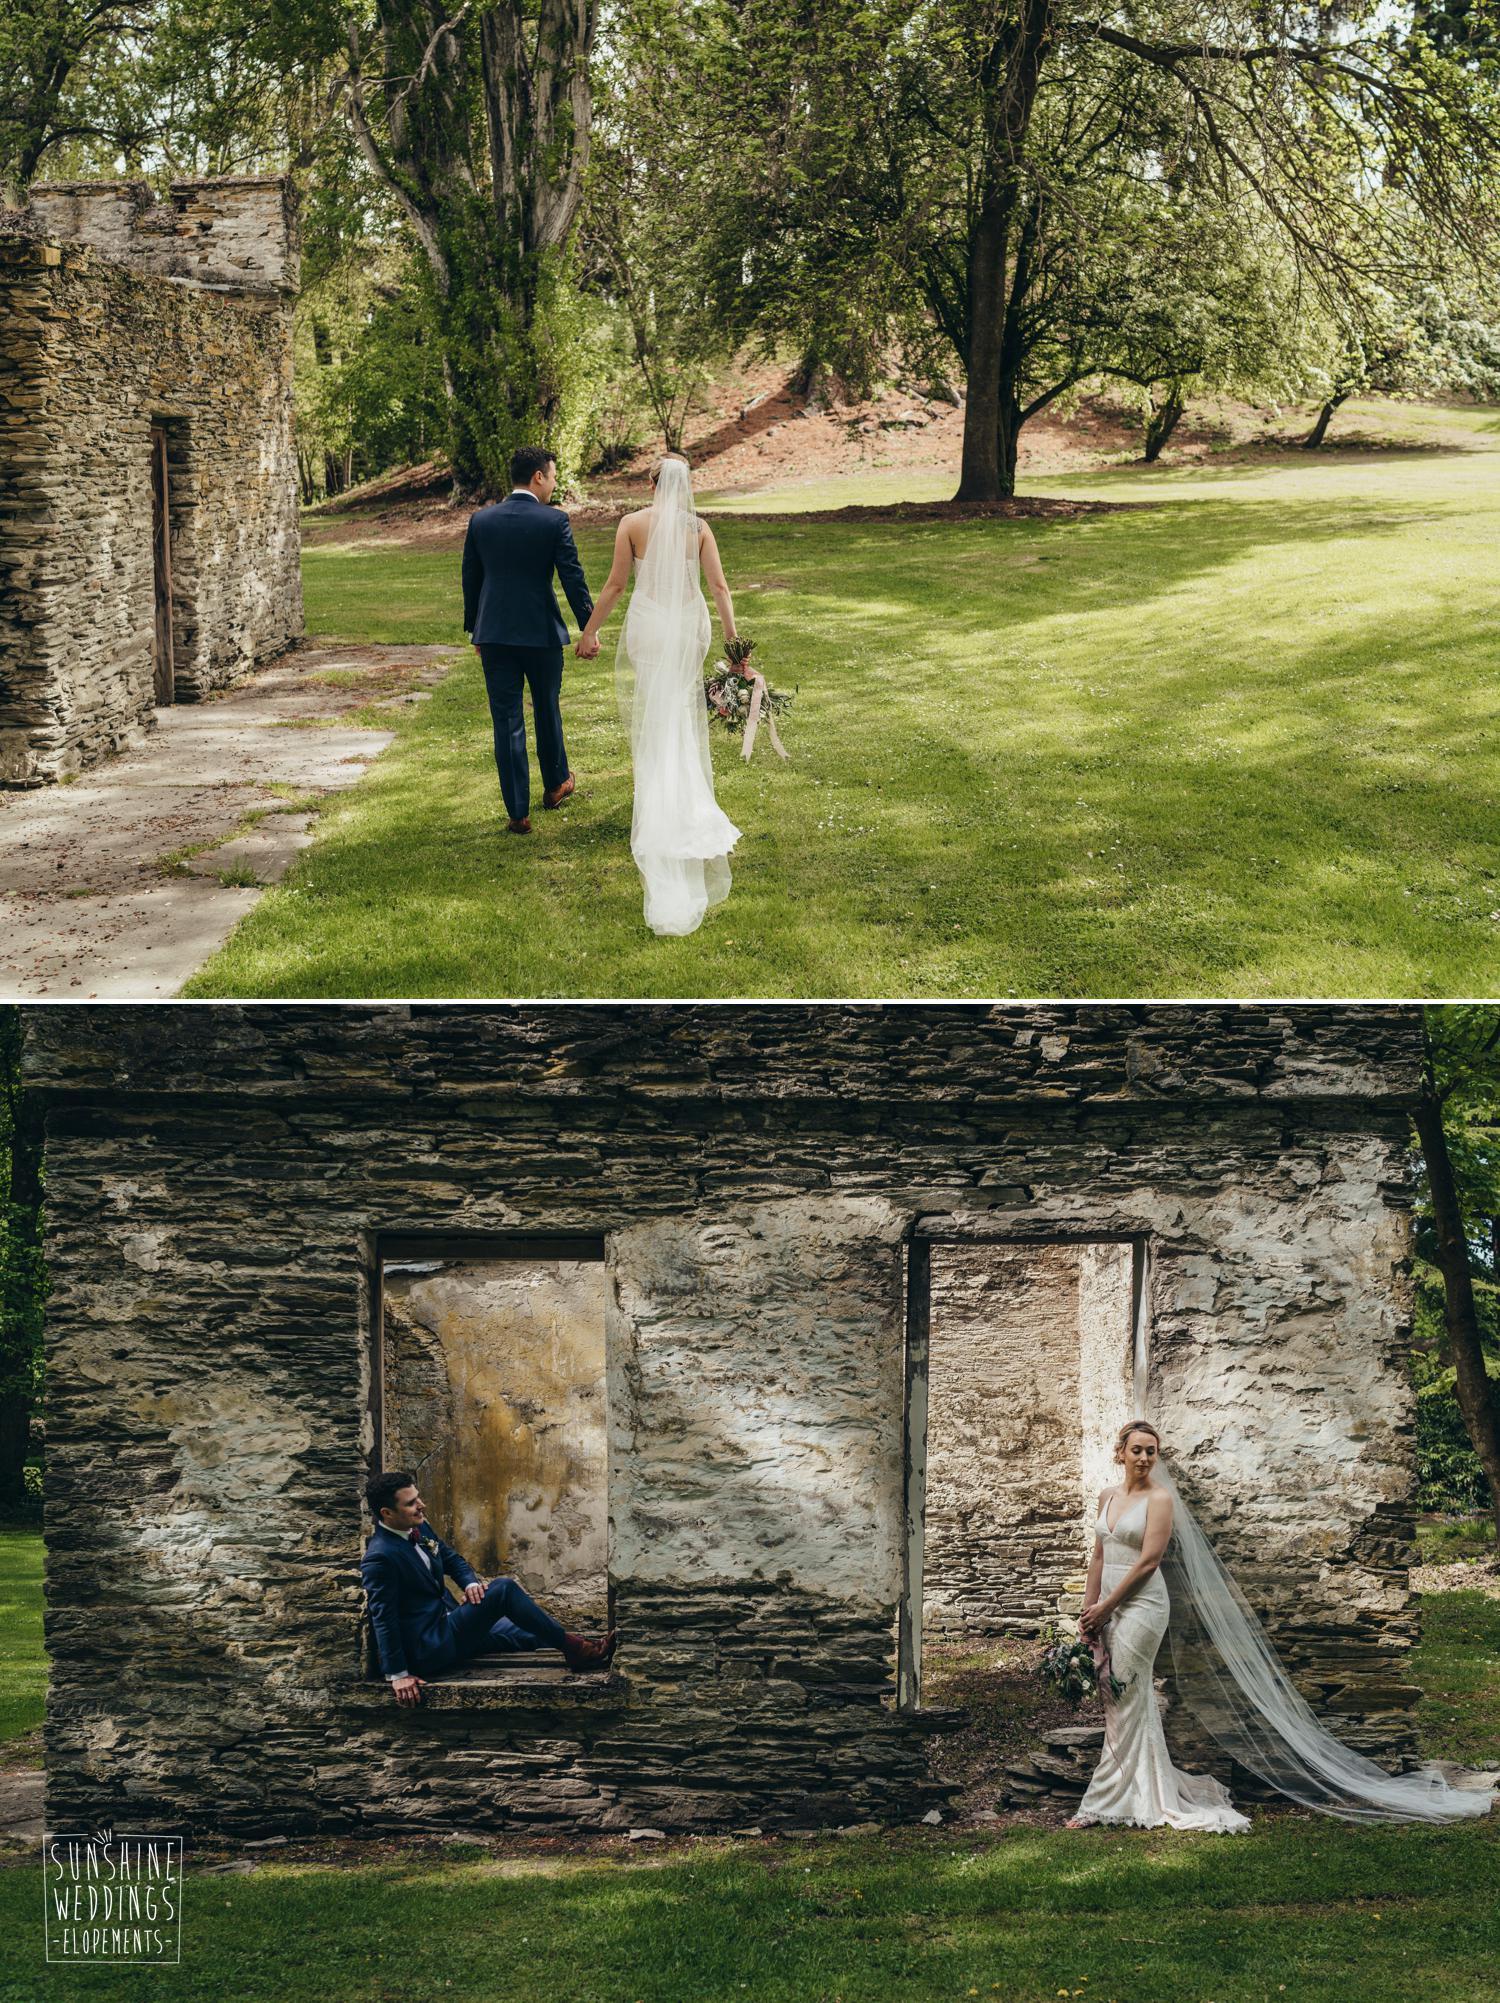 Wedding at Thurlby Domain Queenstonw wedding venue